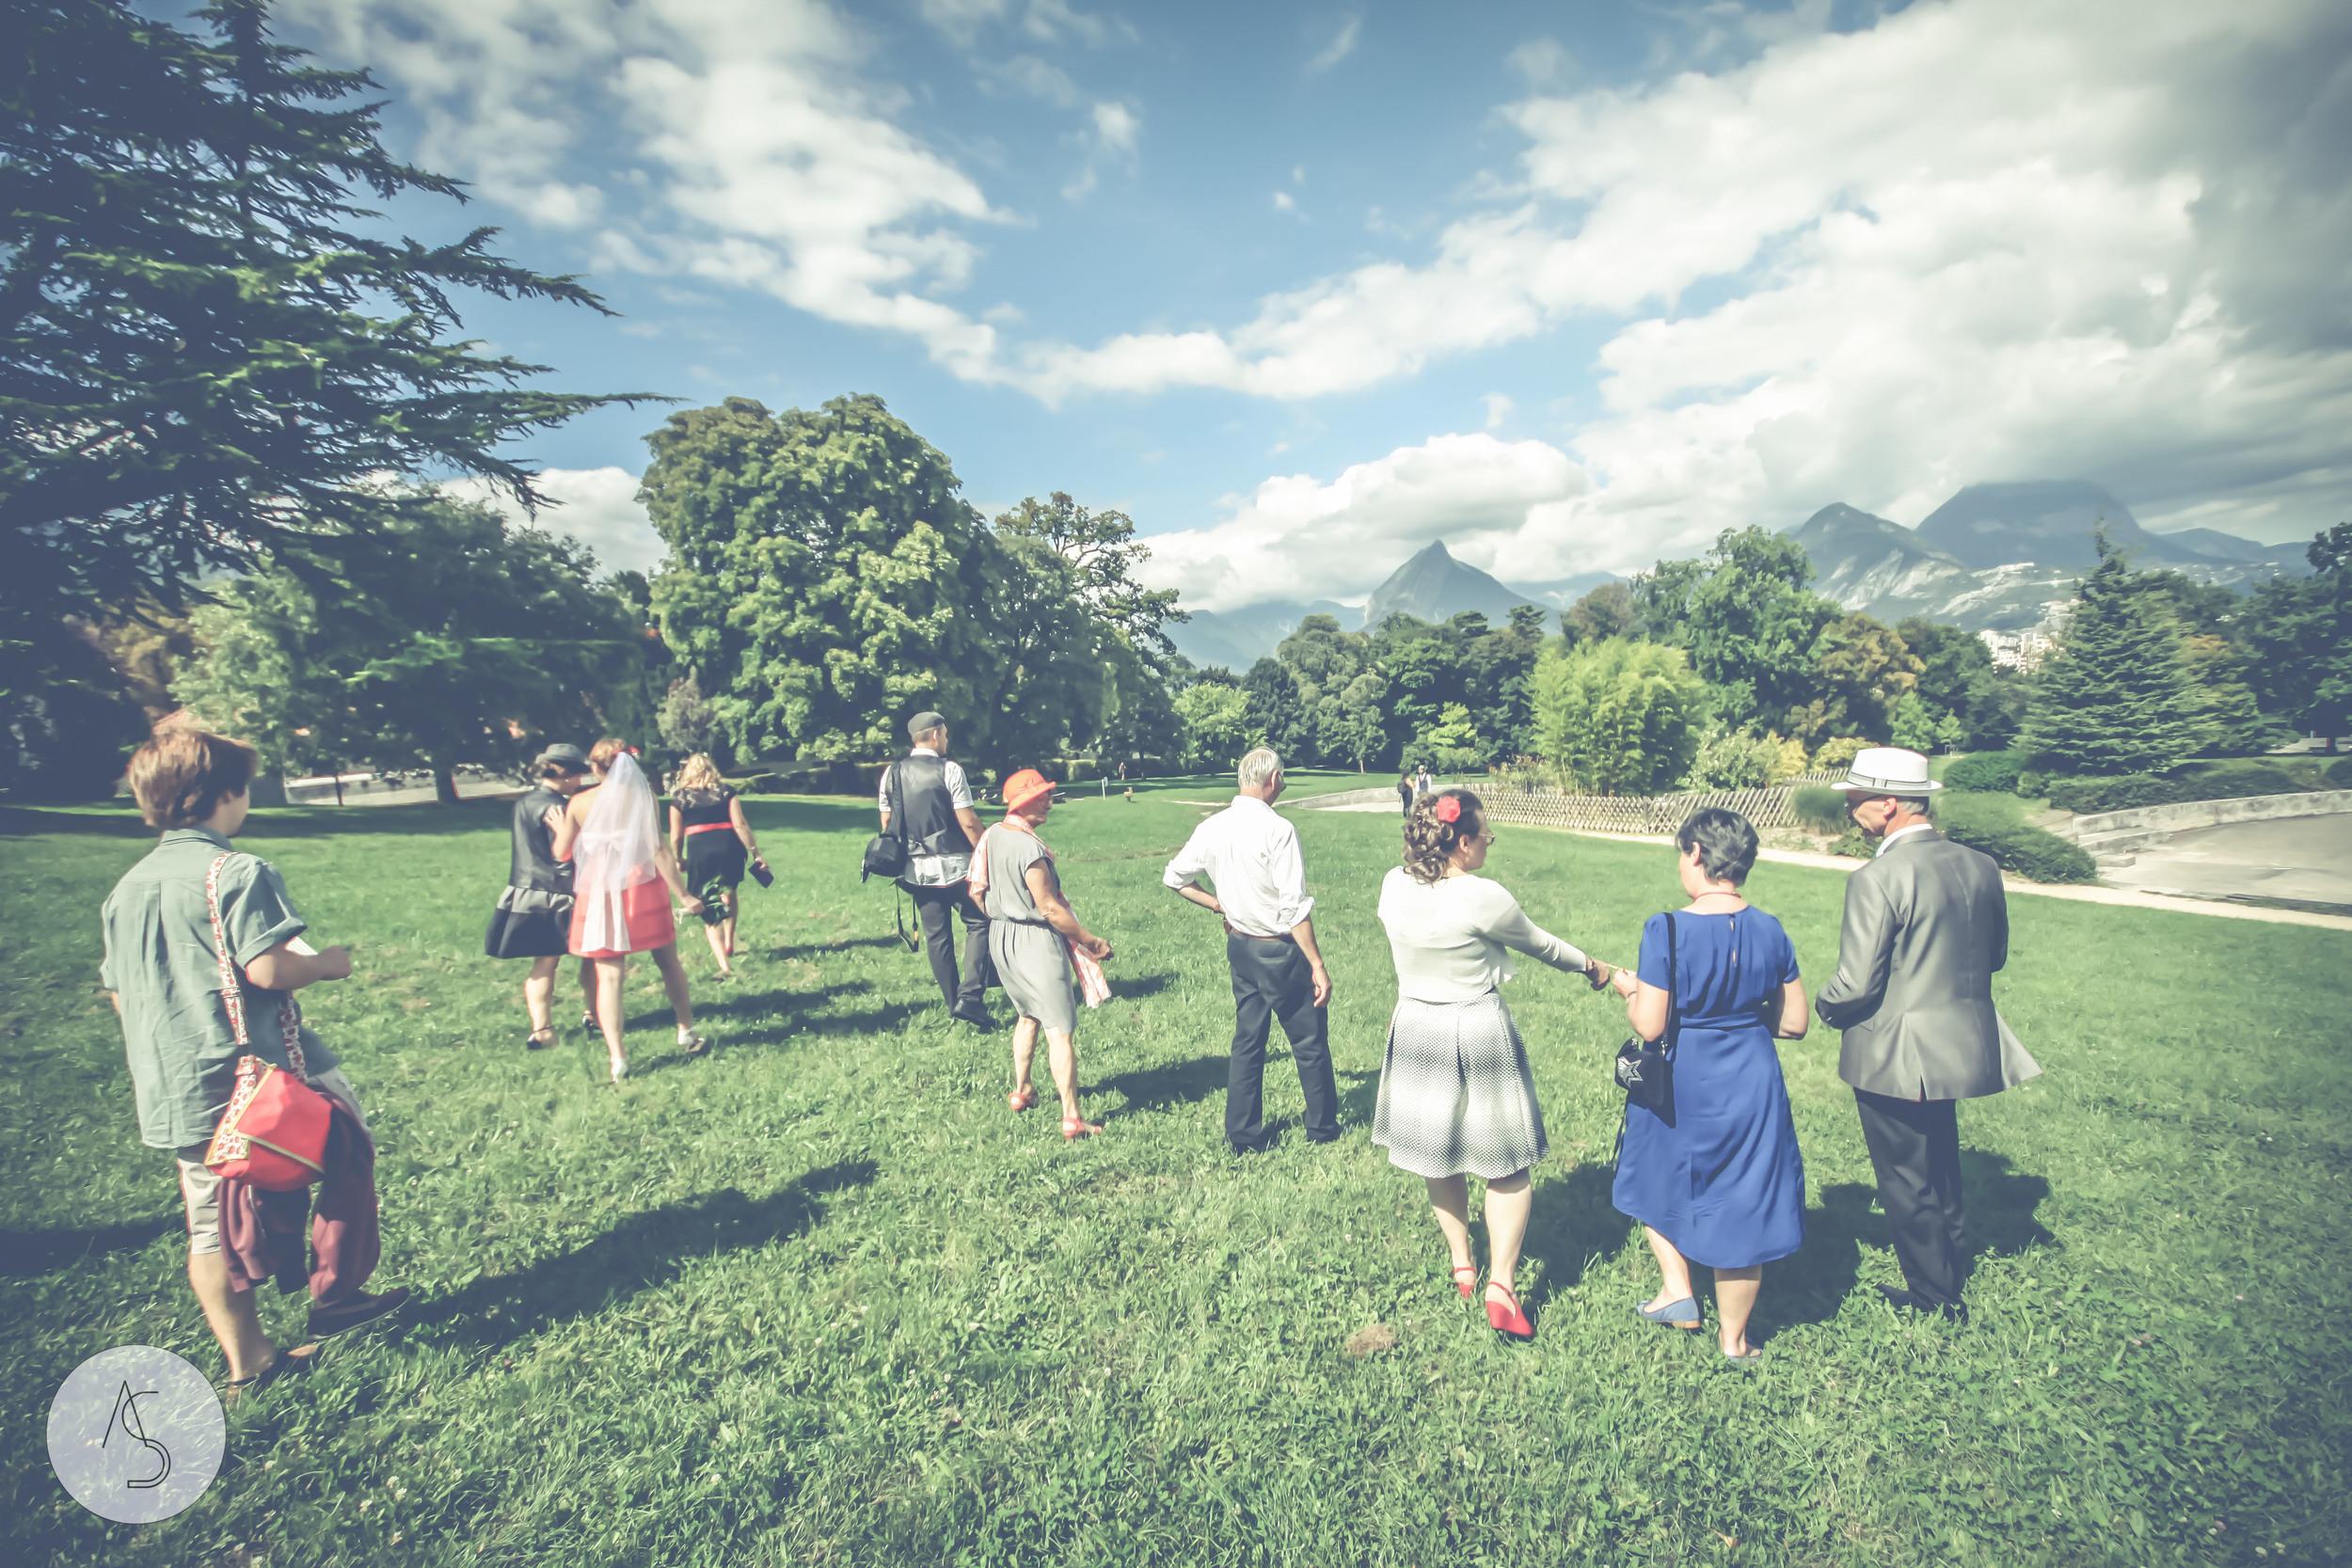 photographe mariage - Grenoble - Rhone Alpes - Adriana Salazar photo-85.jpg